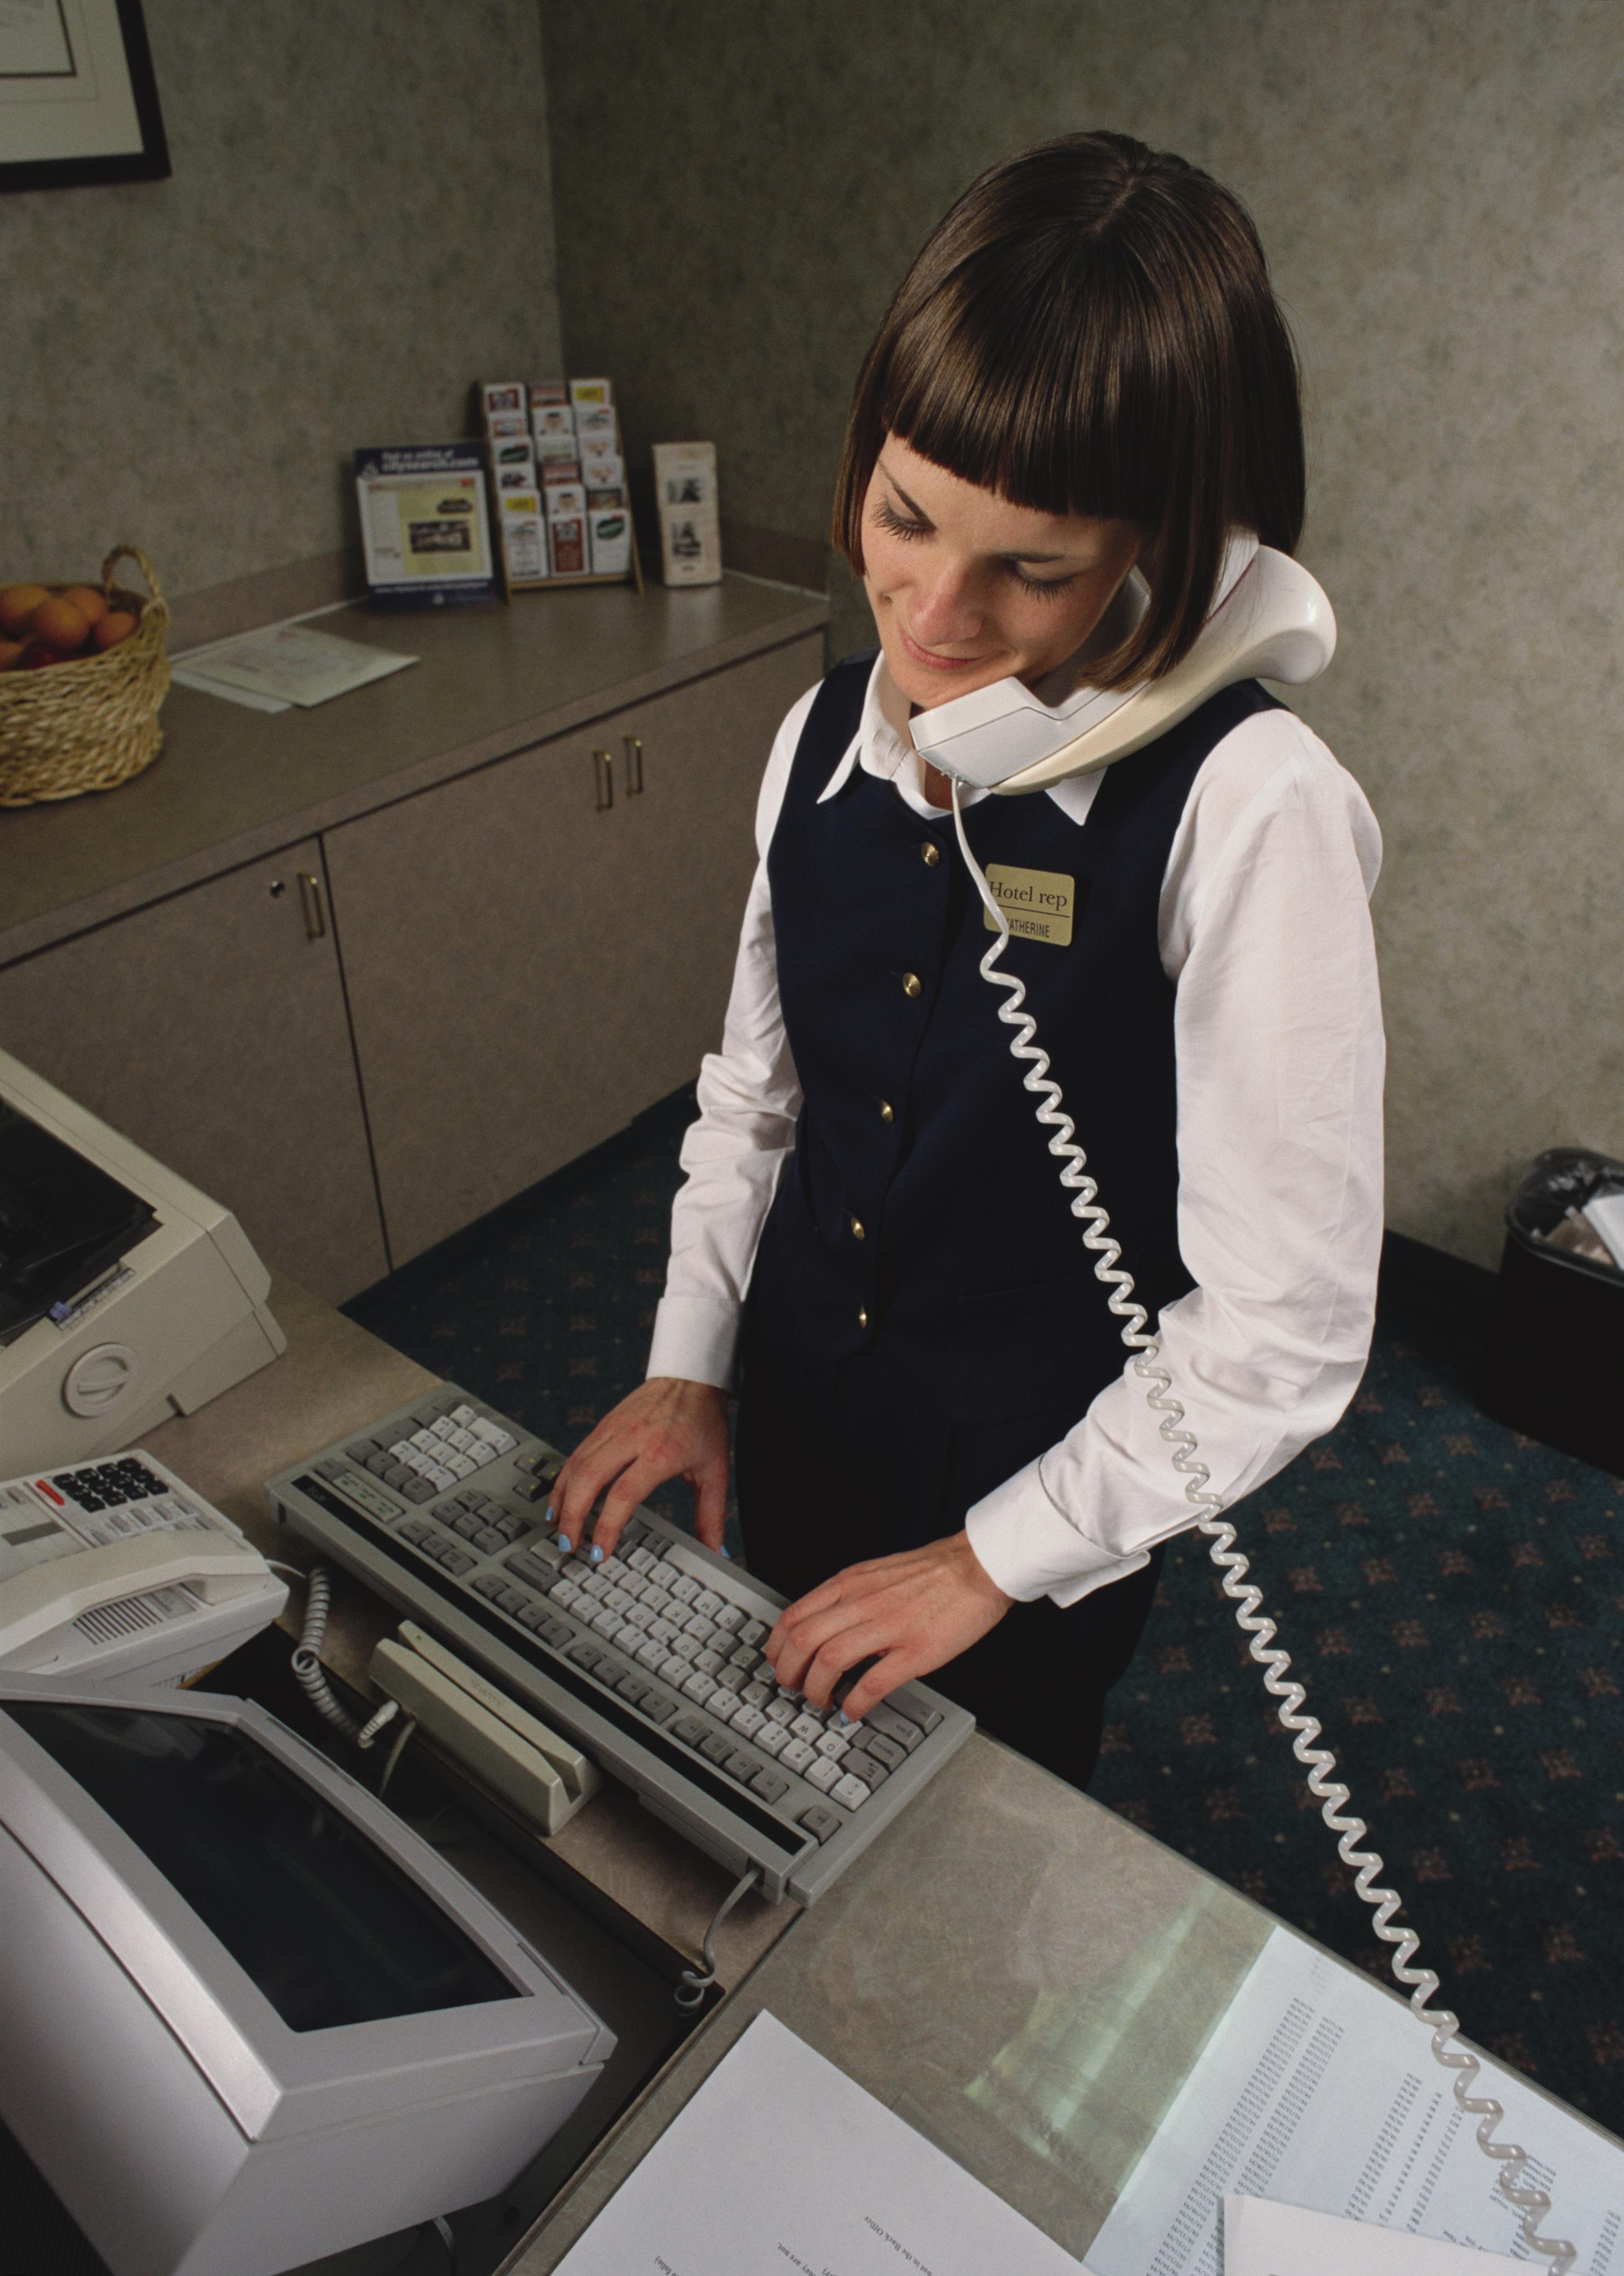 Alternative Job Titles for Receptionists | Career Trend